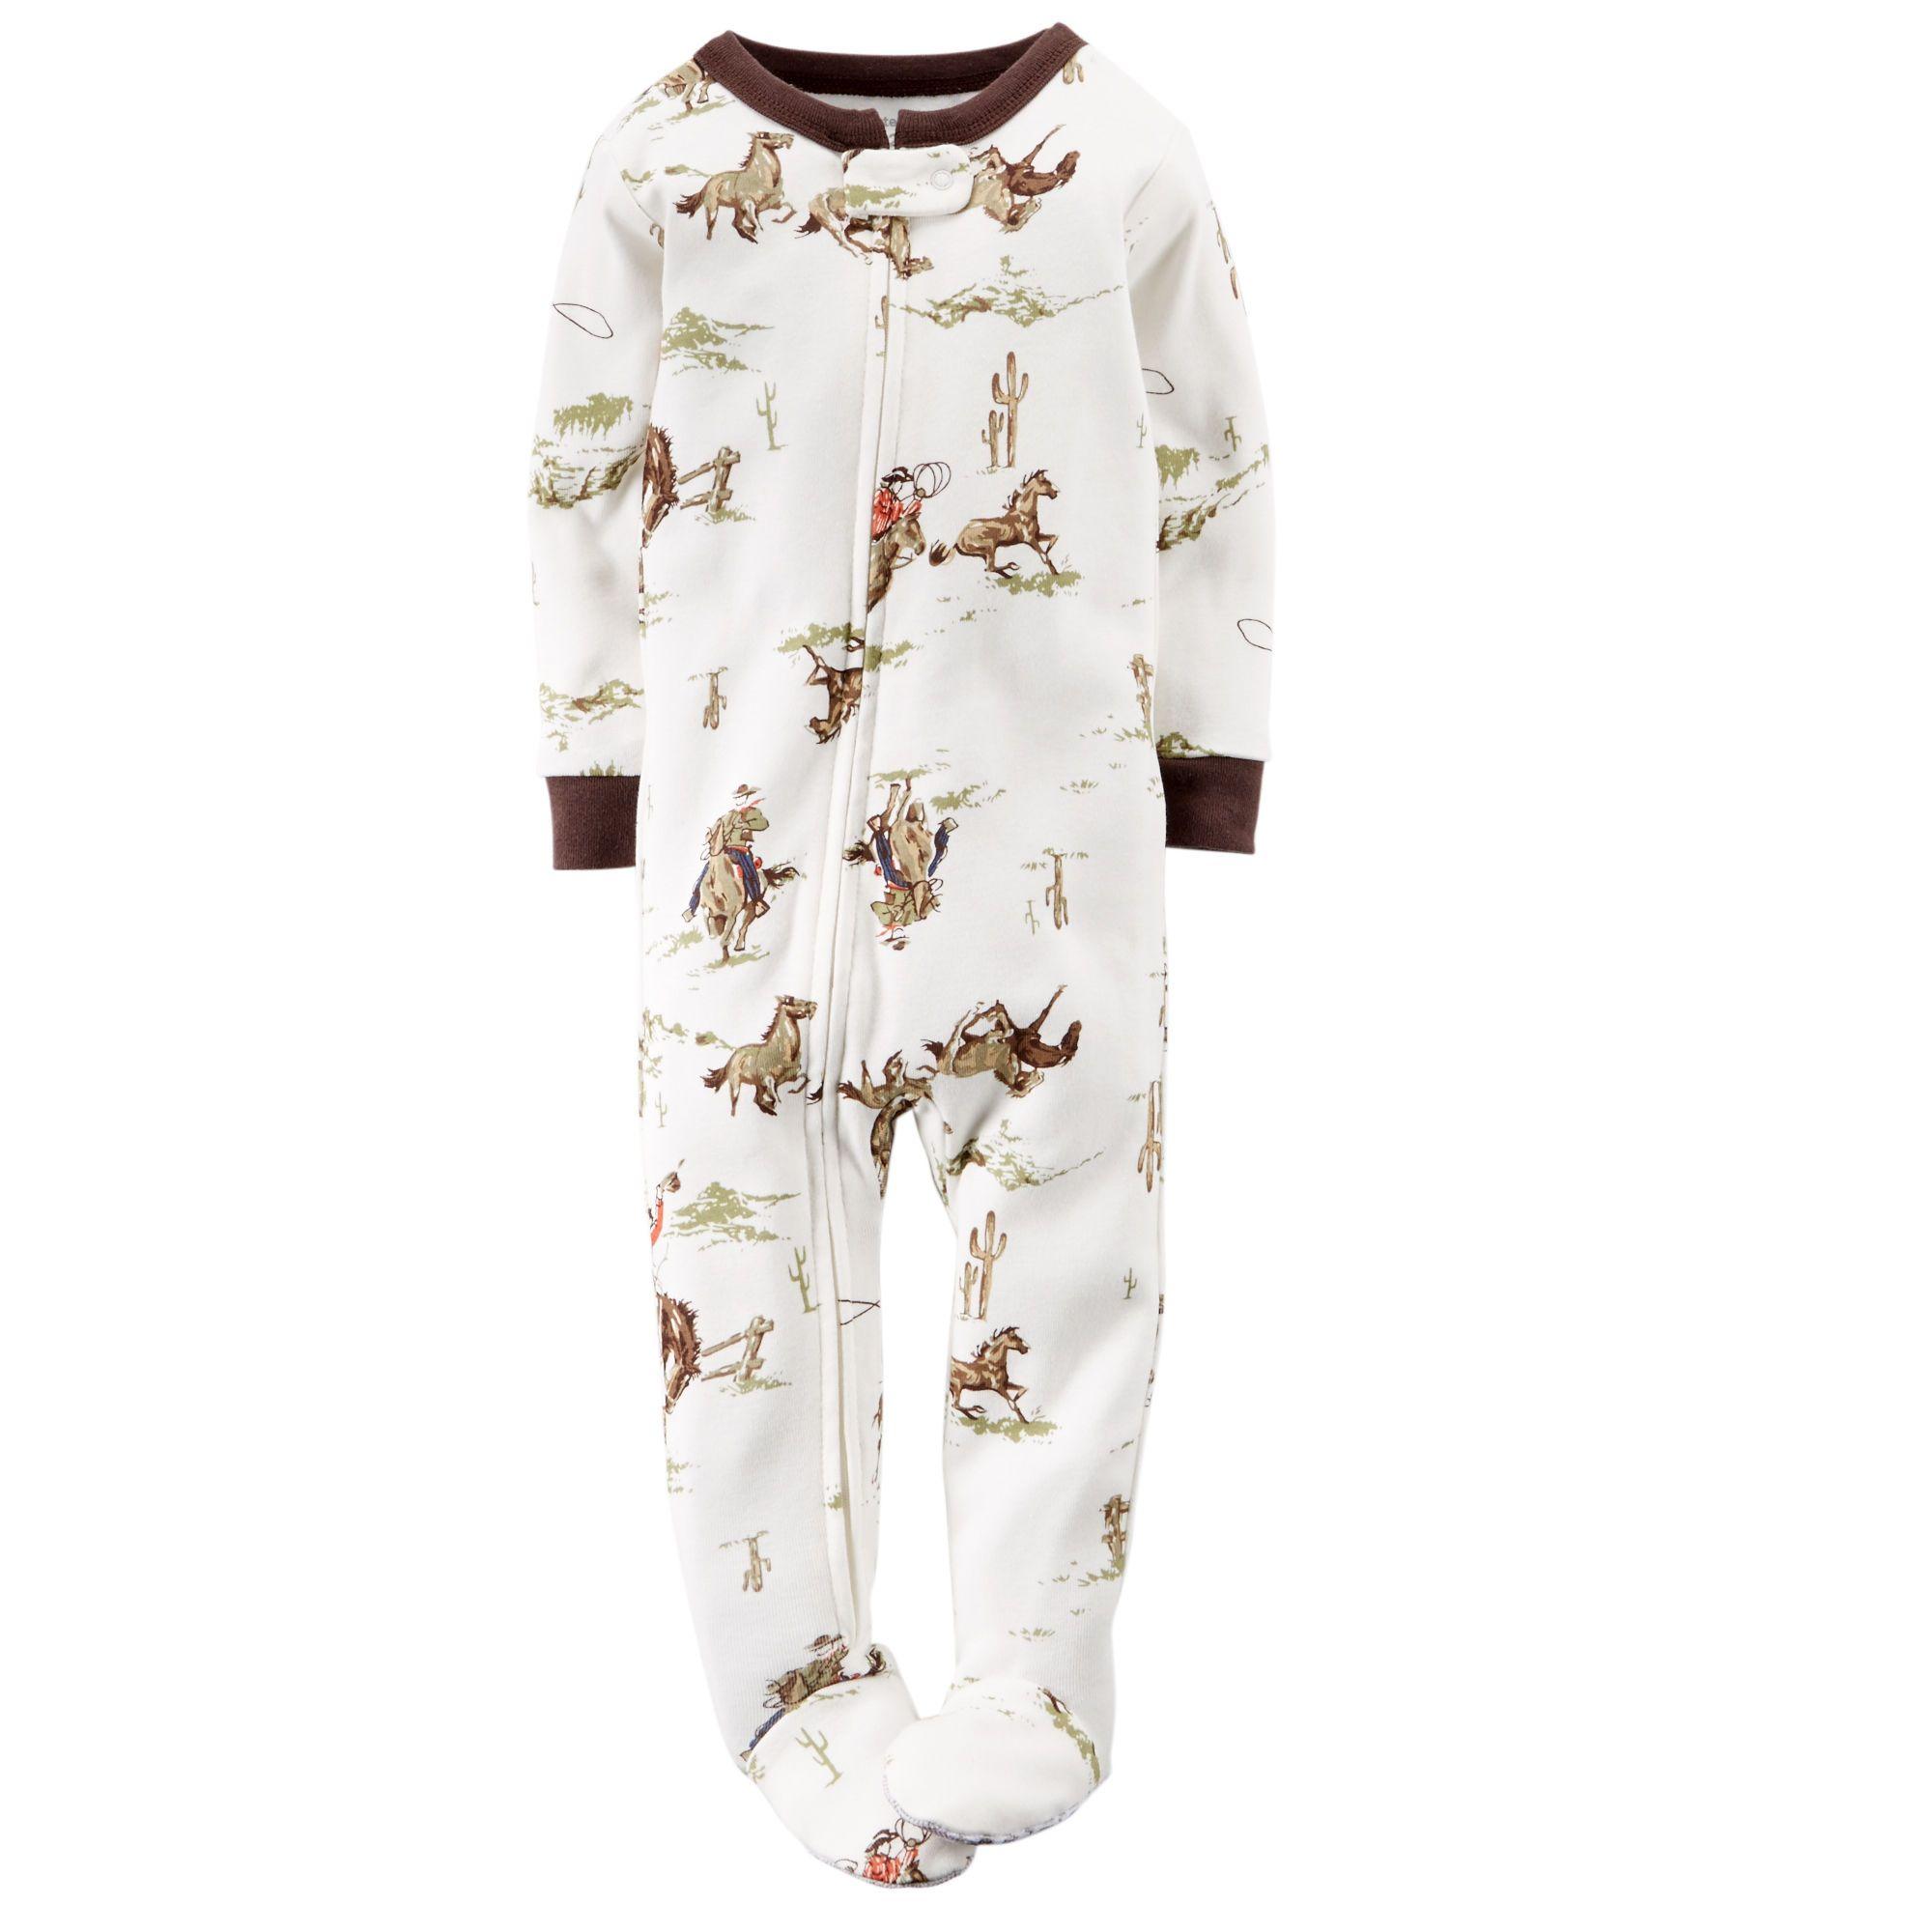 1-Piece Snug Fit Cotton PJs | Carters.com